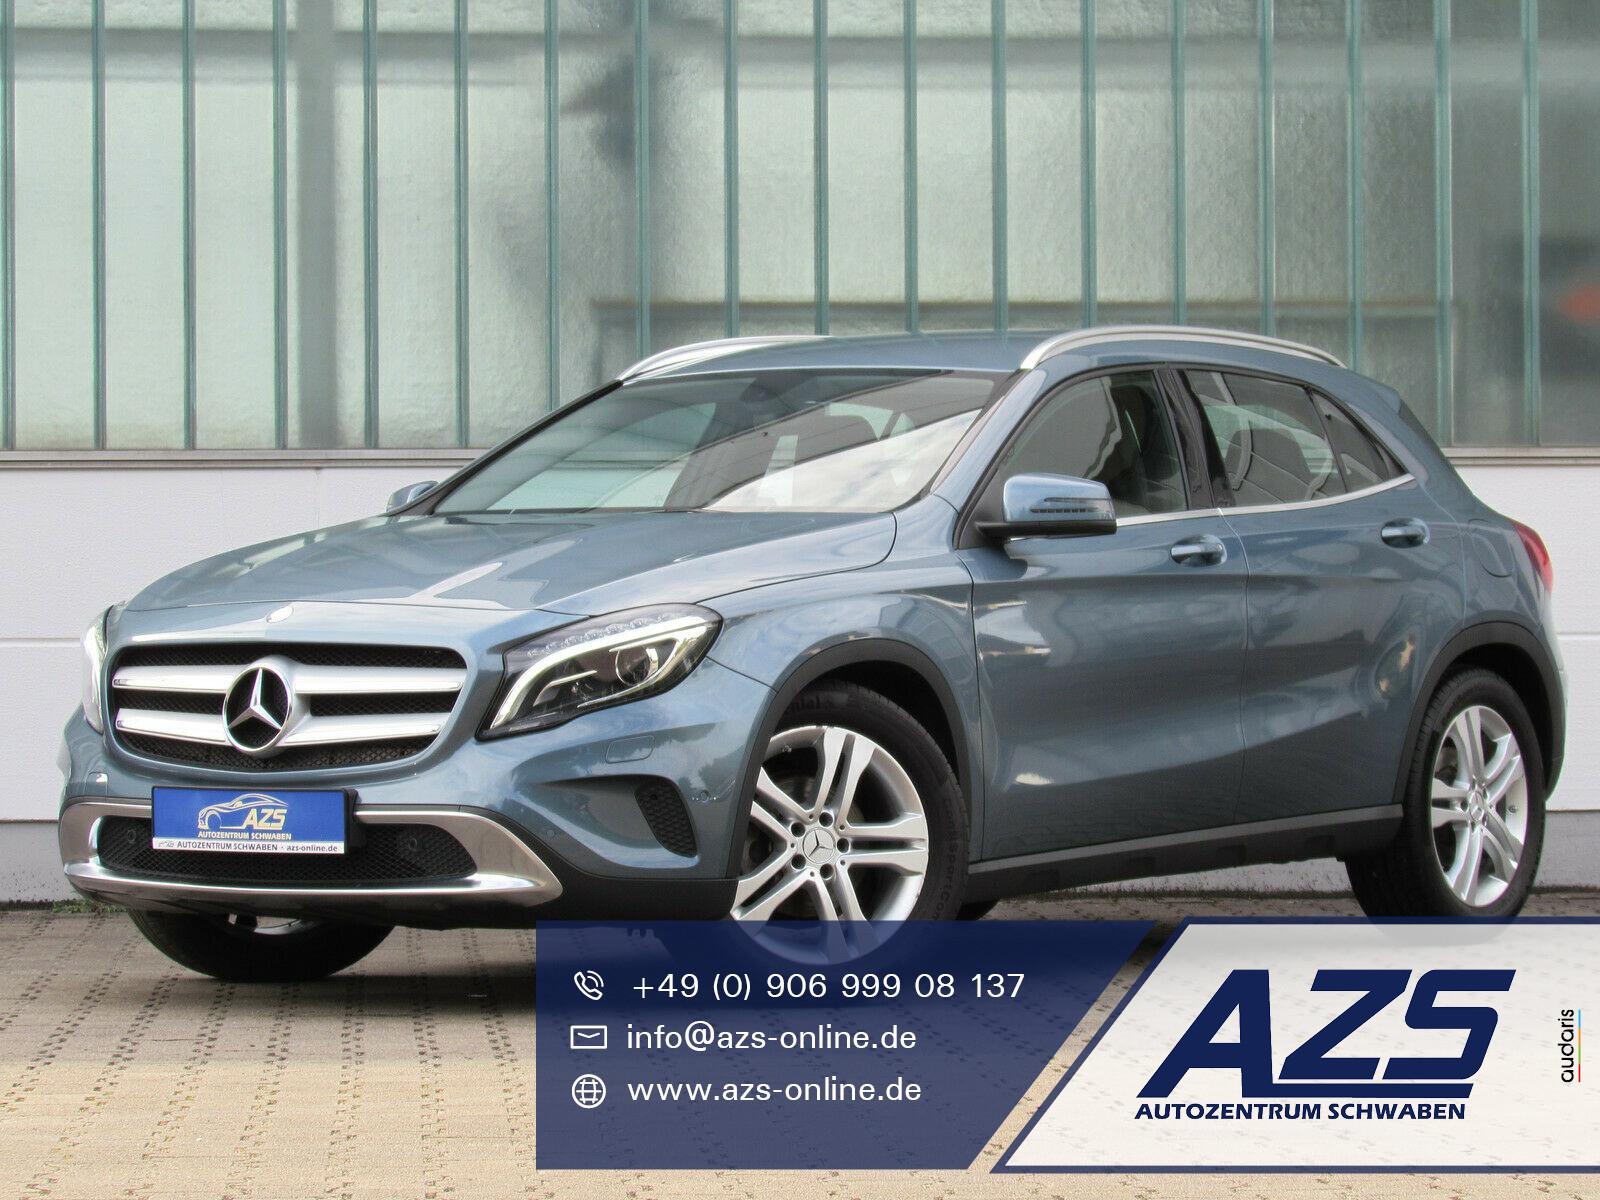 Mercedes-Benz GLA 180 CDI   Bi-Xenon   Klima   Parkhilfe  , Jahr 2015, Diesel